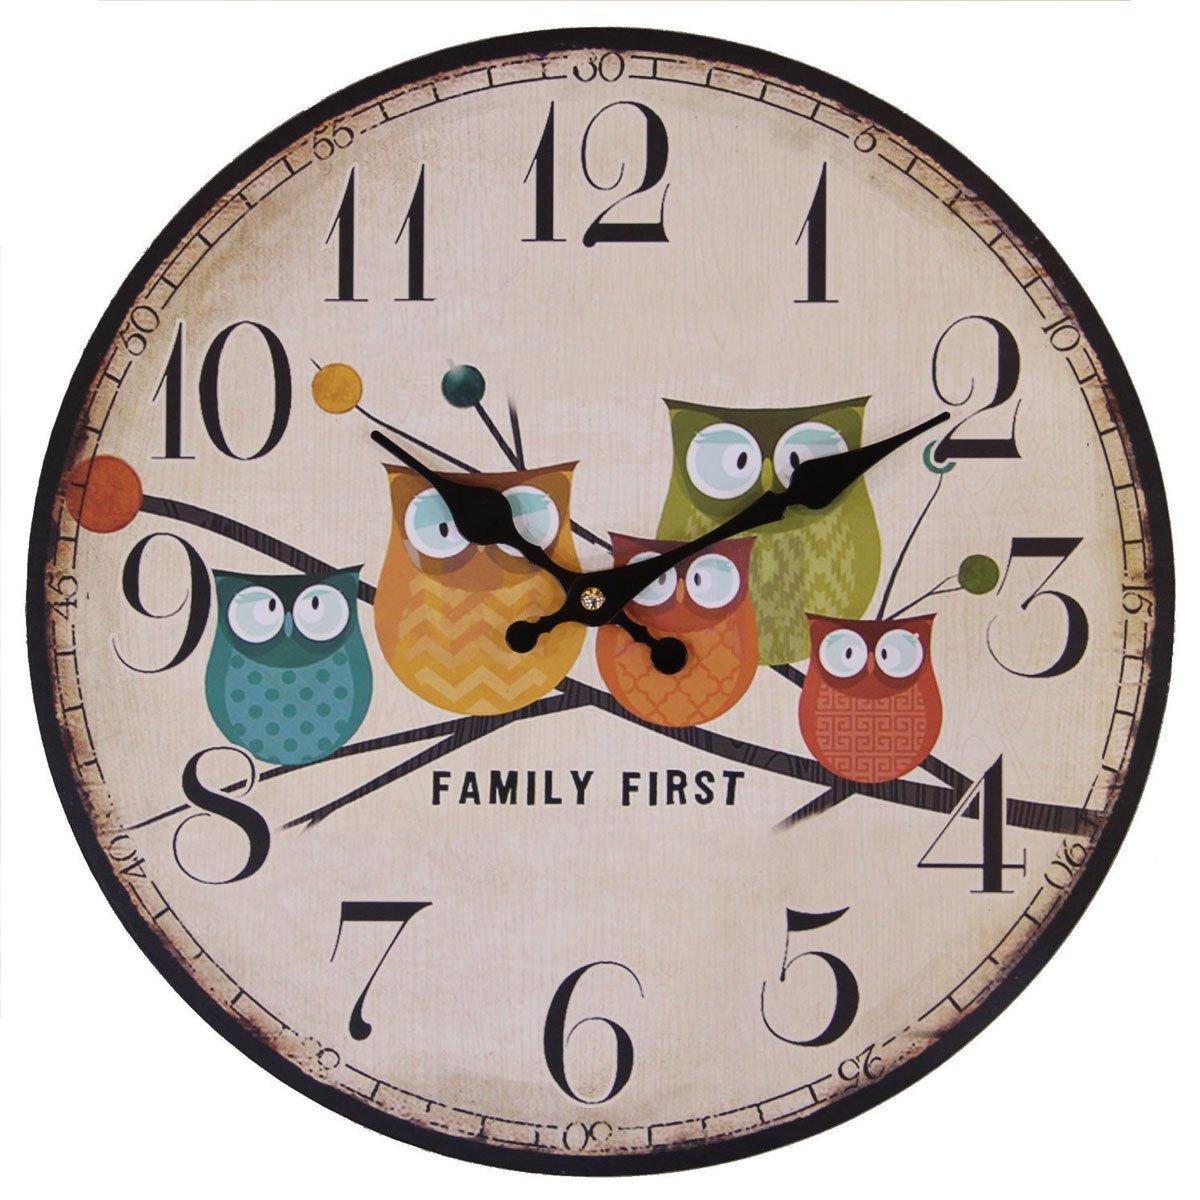 Besplore Children's Room Wall Clock, 12-Inch Eruner Painted Owls Animated Cartoon Wood Clock Bedroom Nursery Cute Style Silent Family Decoration Wall Art